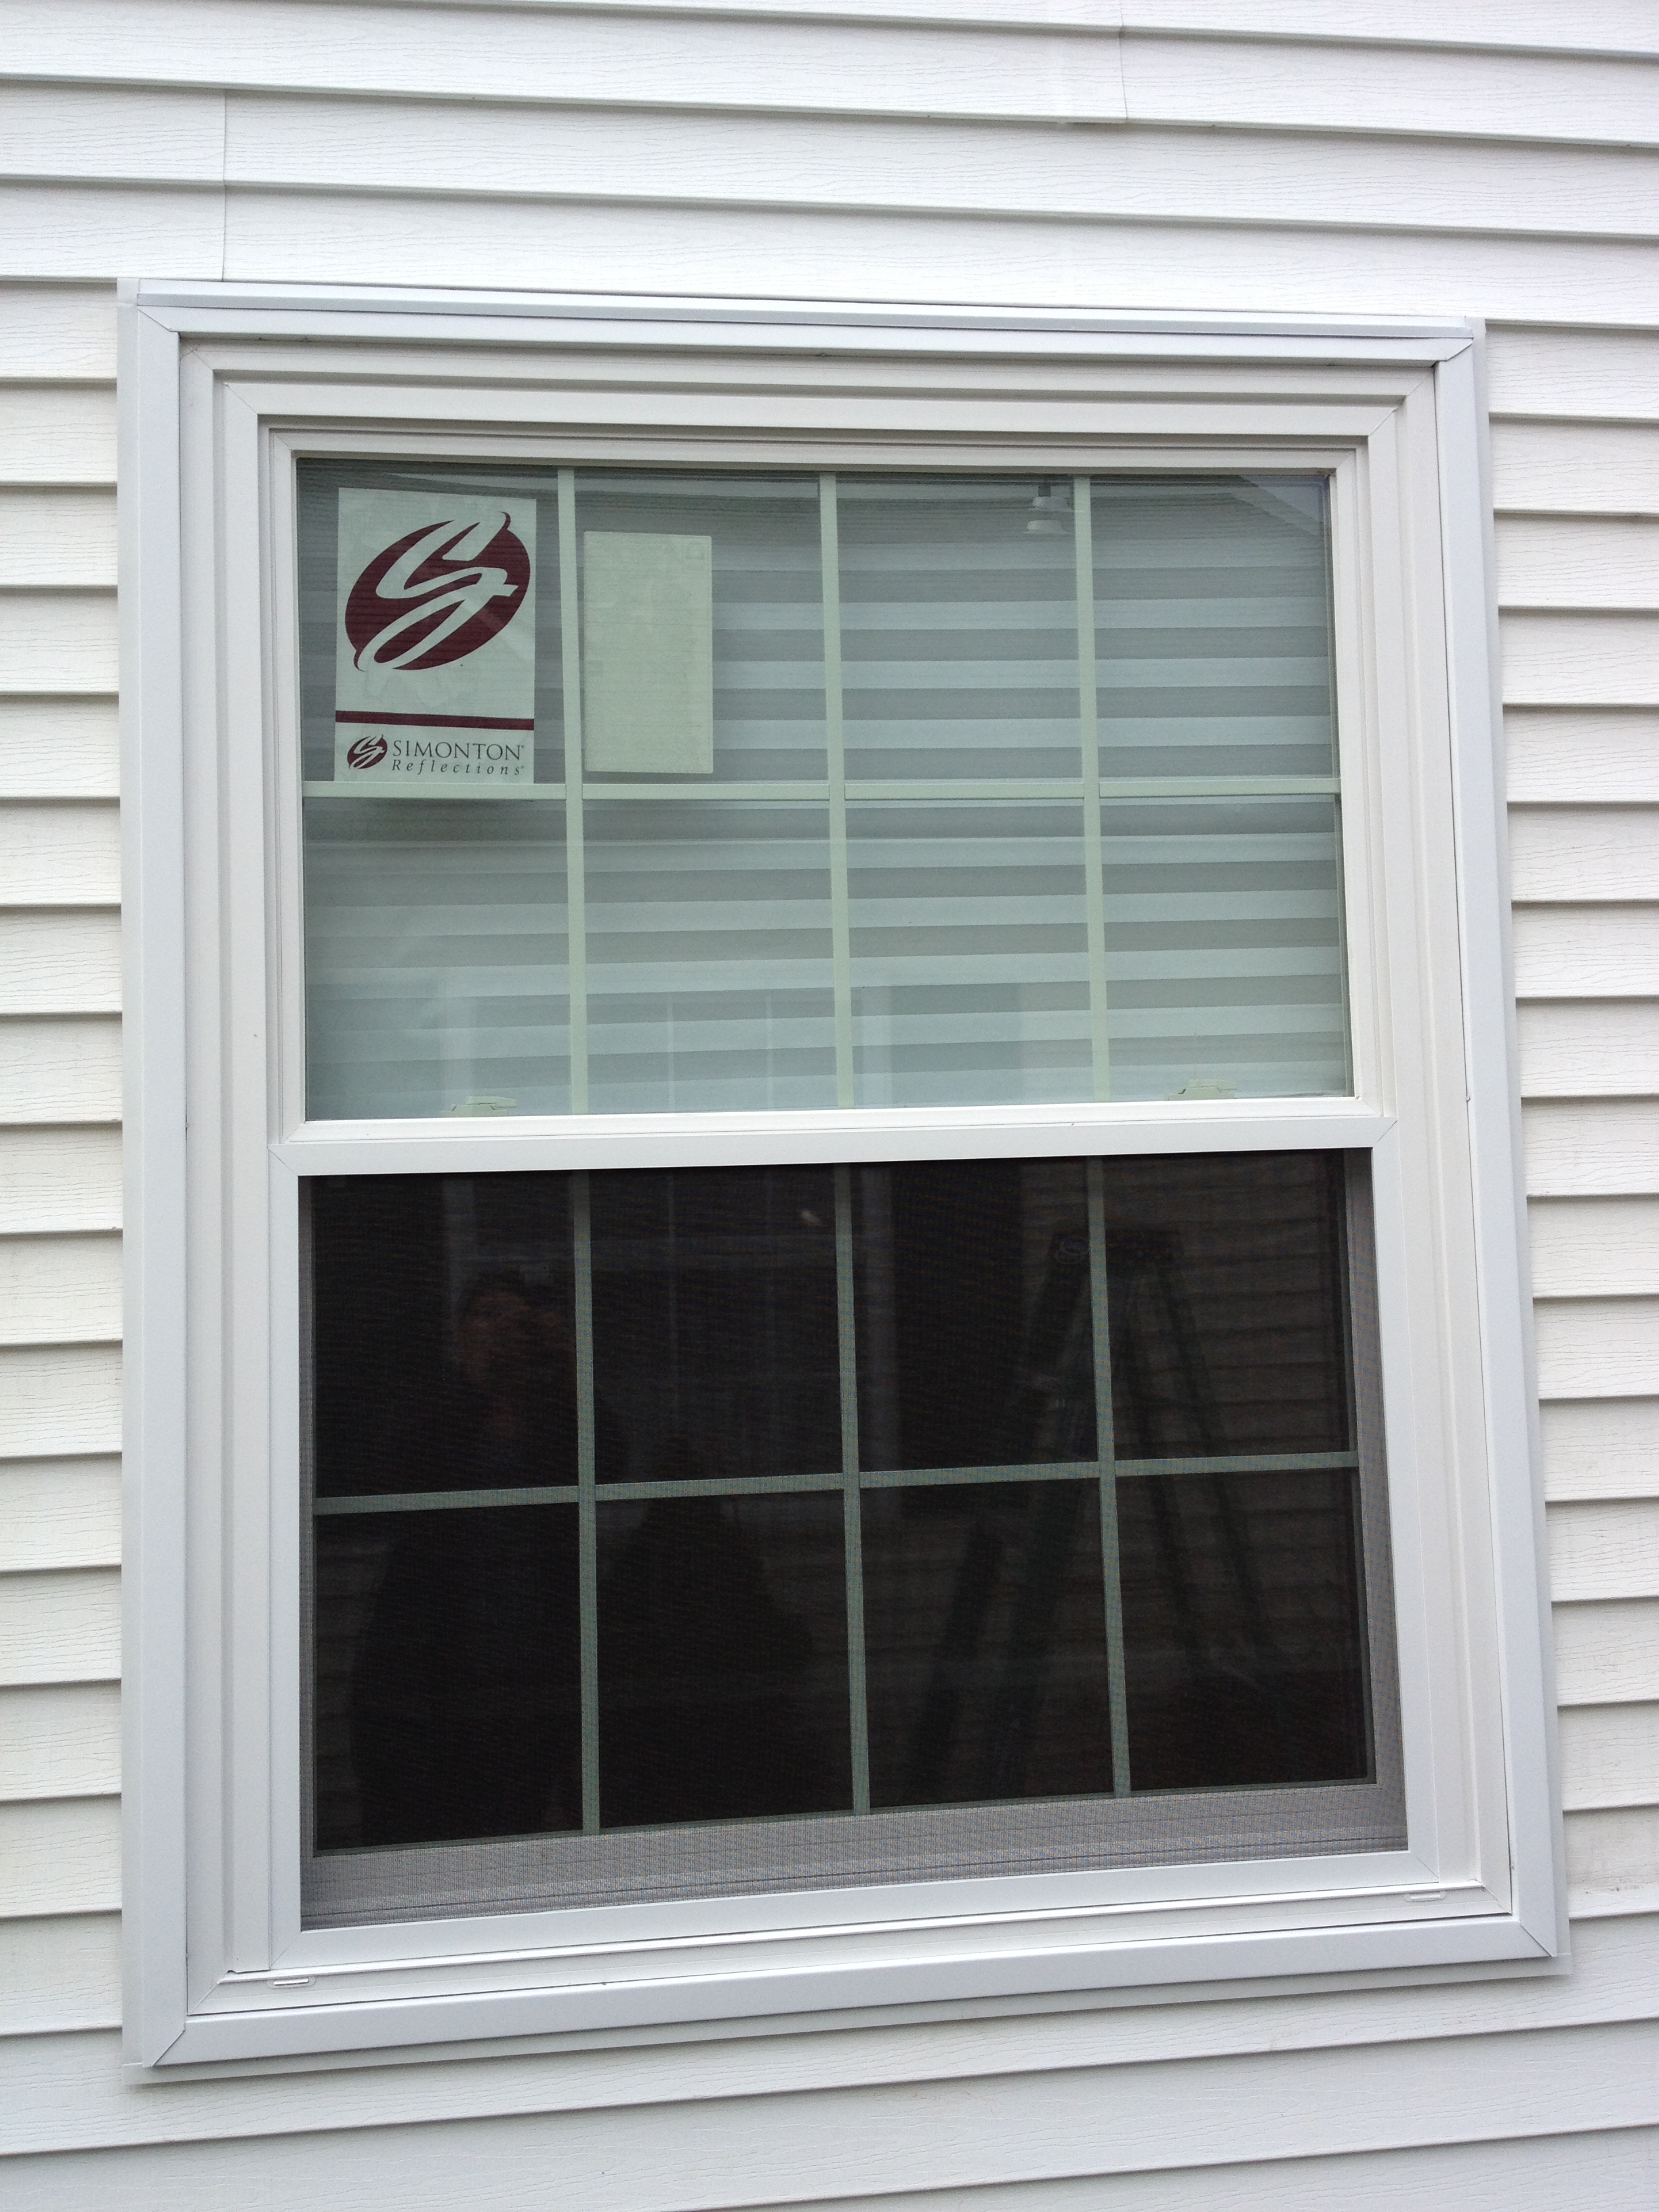 simonton window